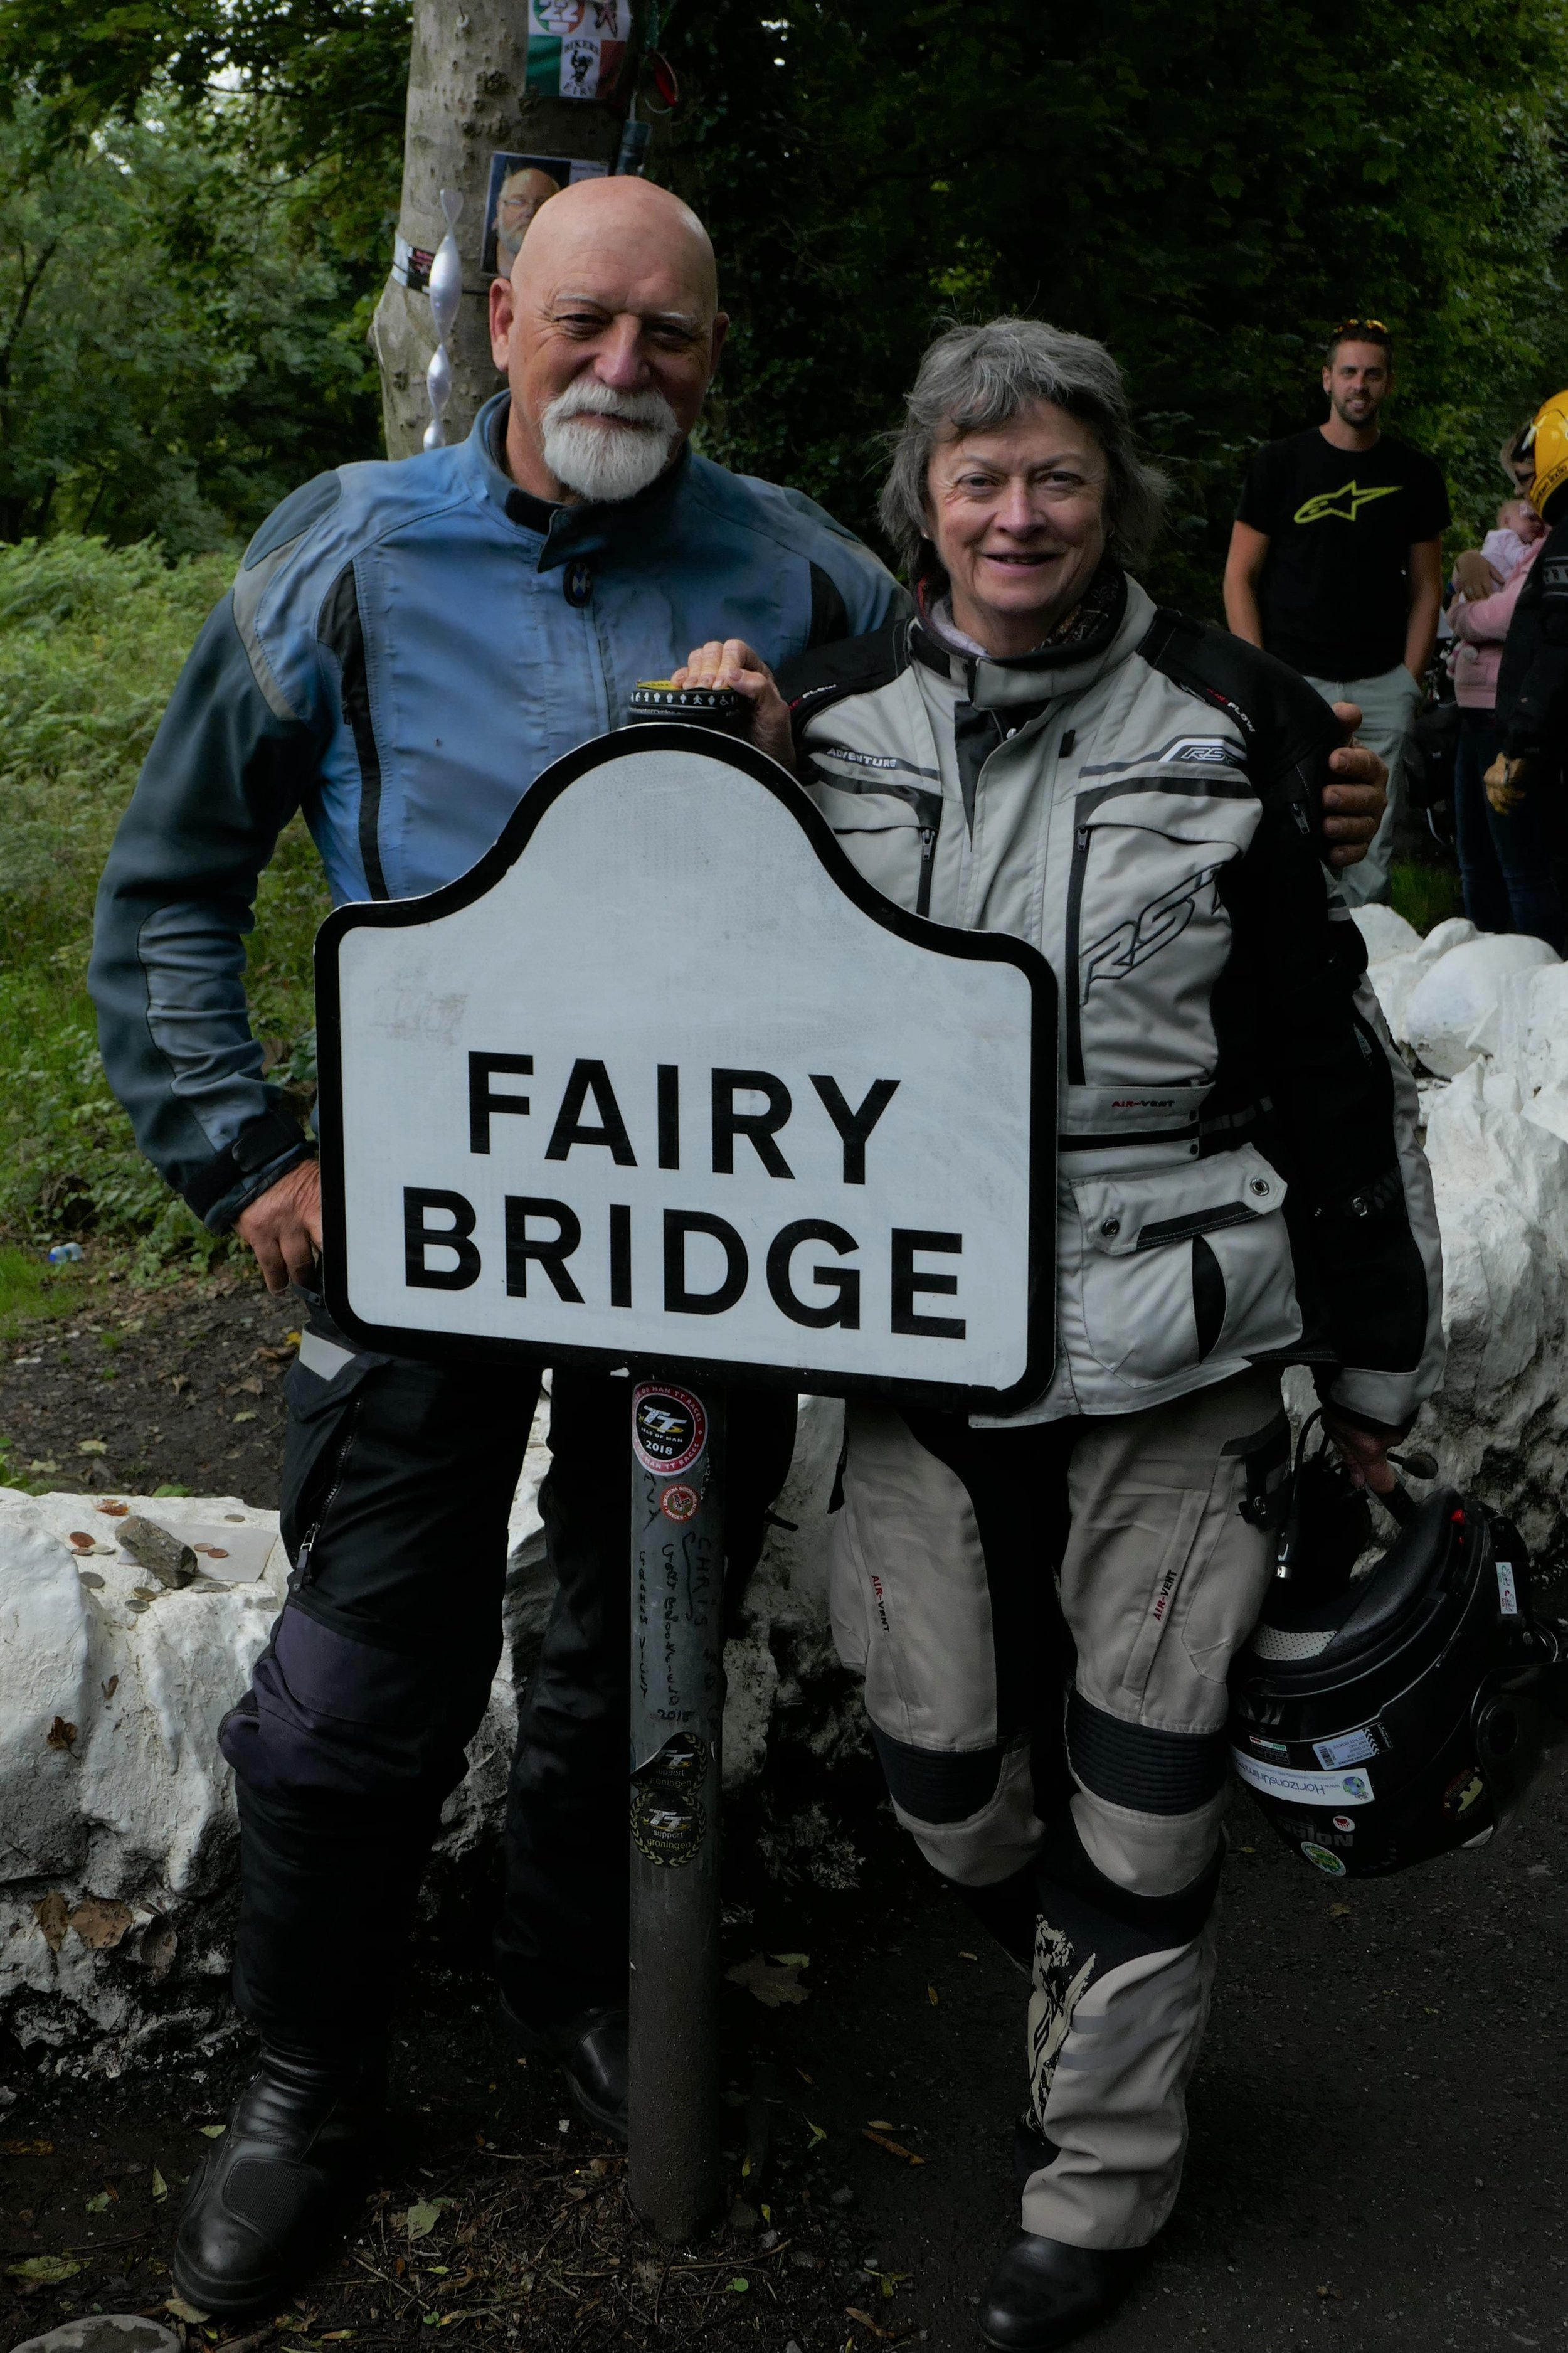 Brian Rix and Shirley Hardy-Rix